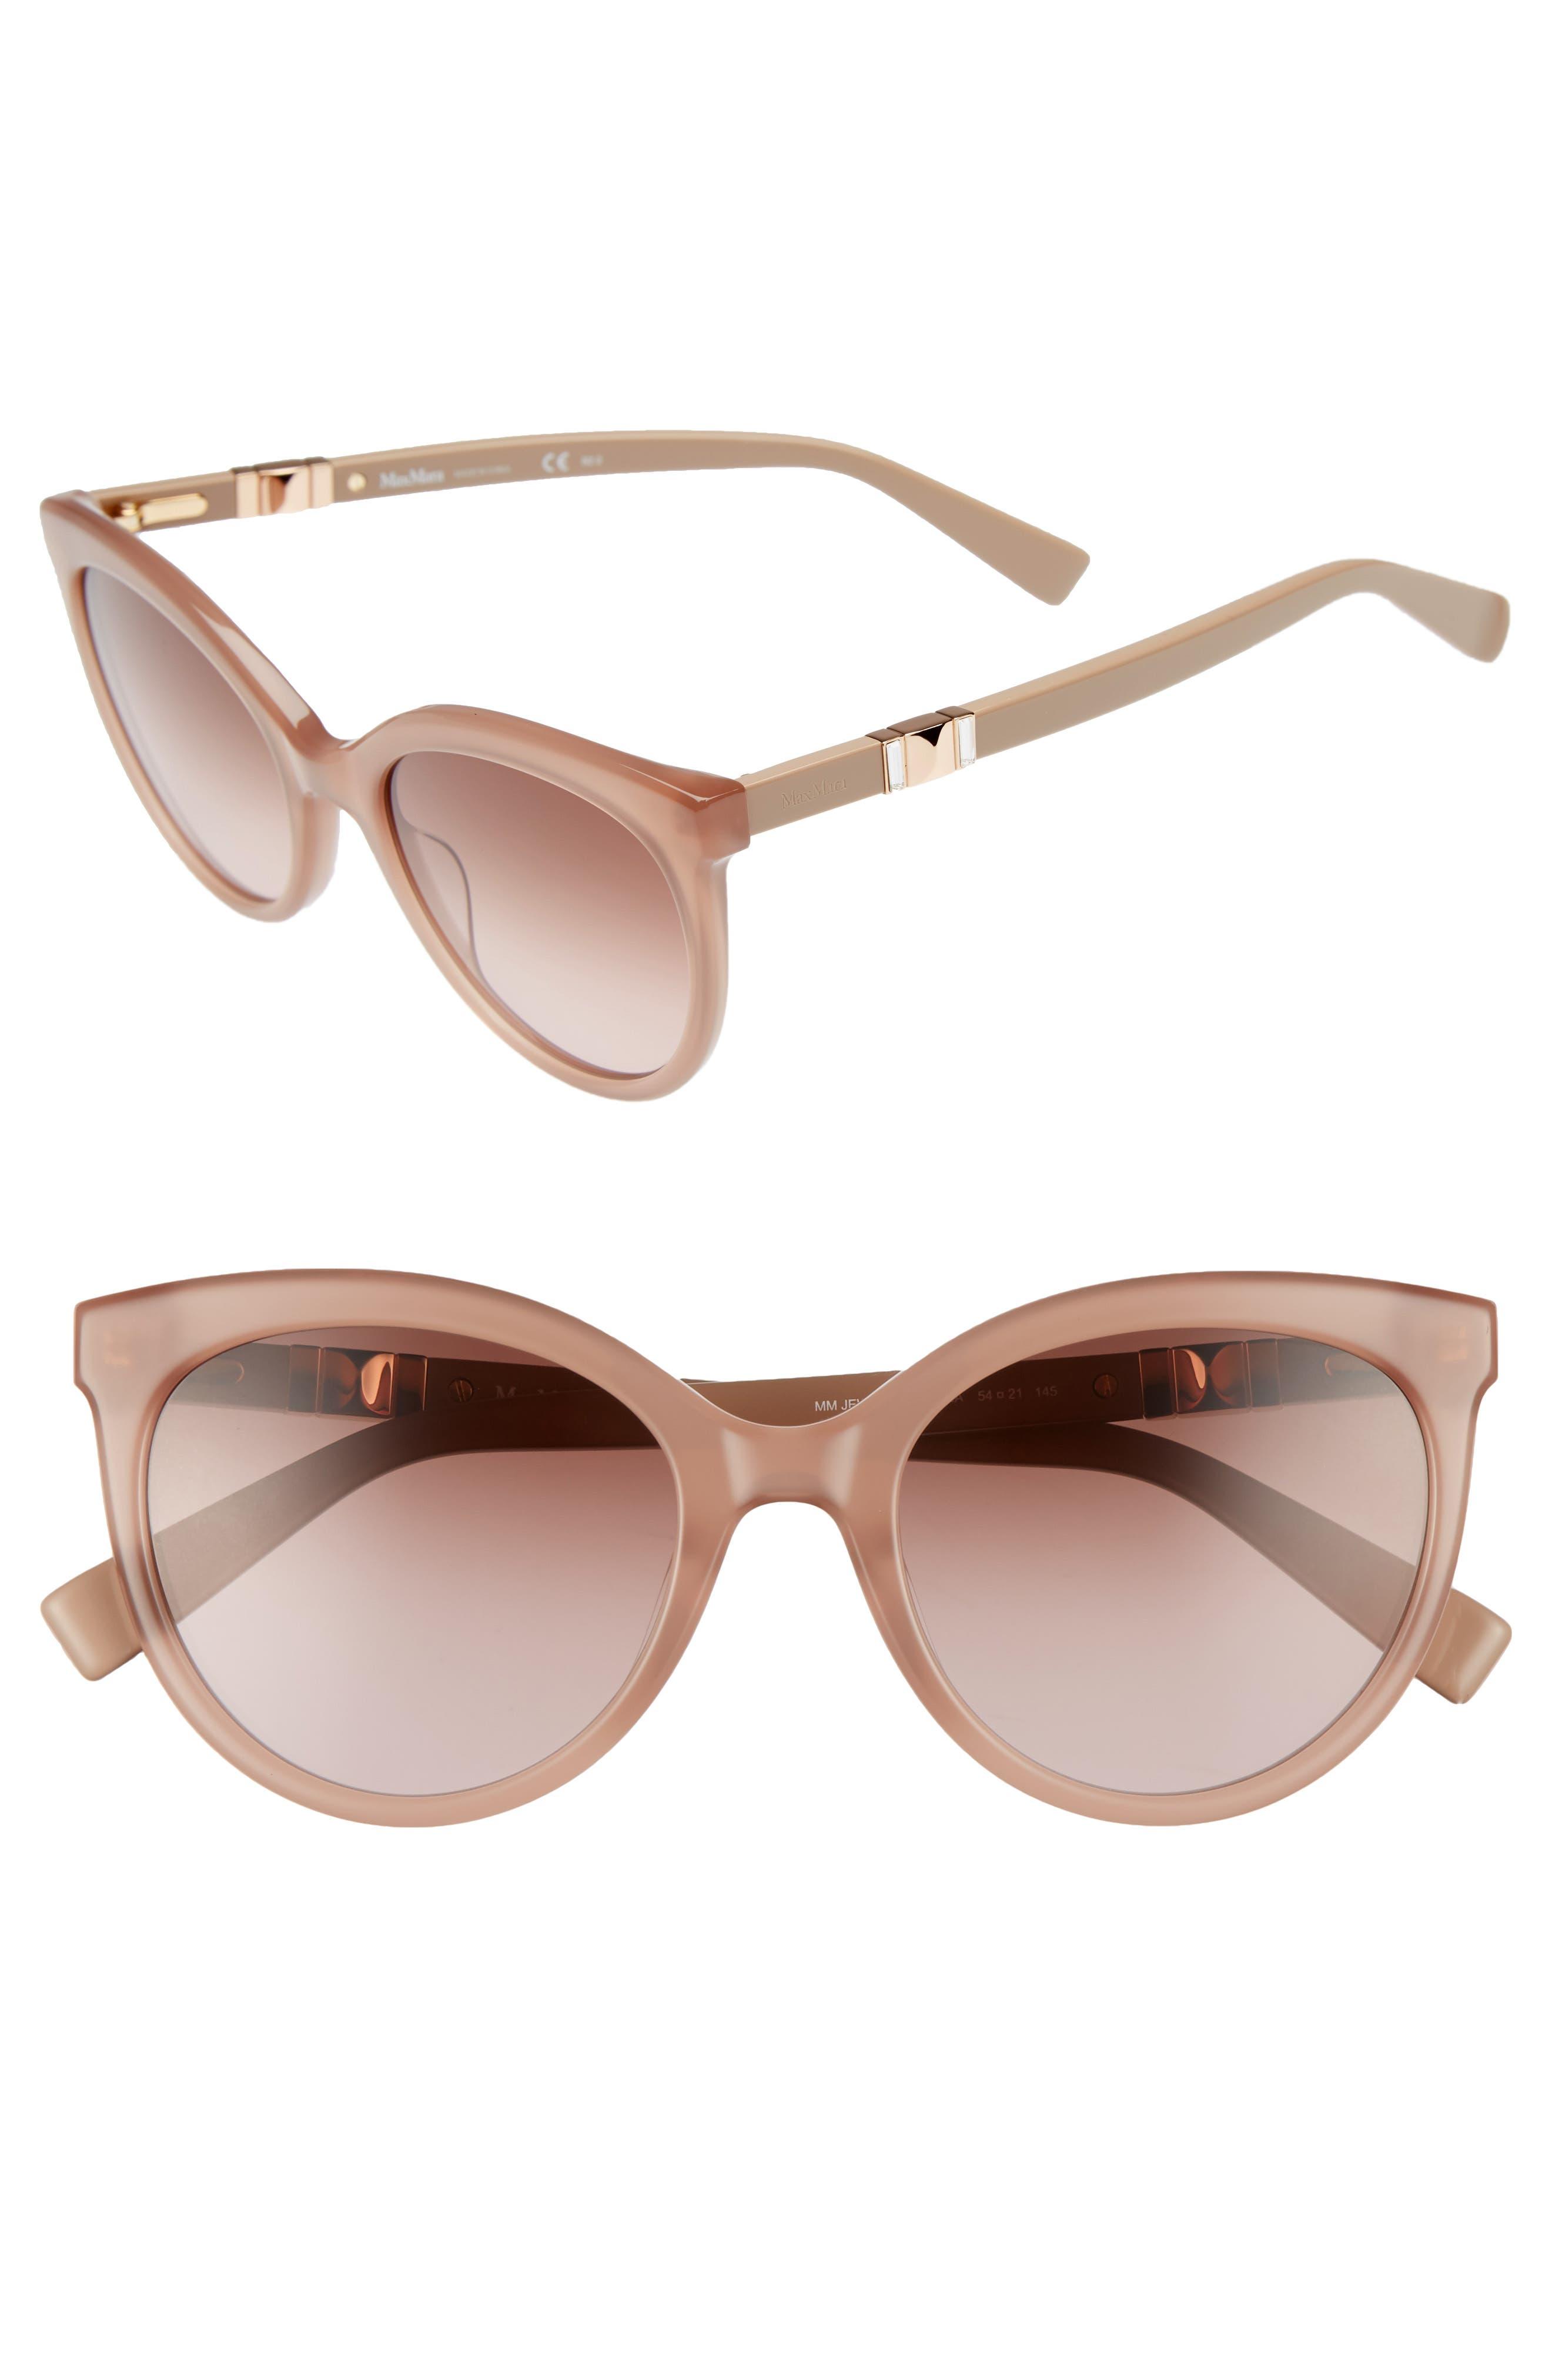 Jeweliis 54mm Gradient Cat Eye Sunglasses,                         Main,                         color, Nude